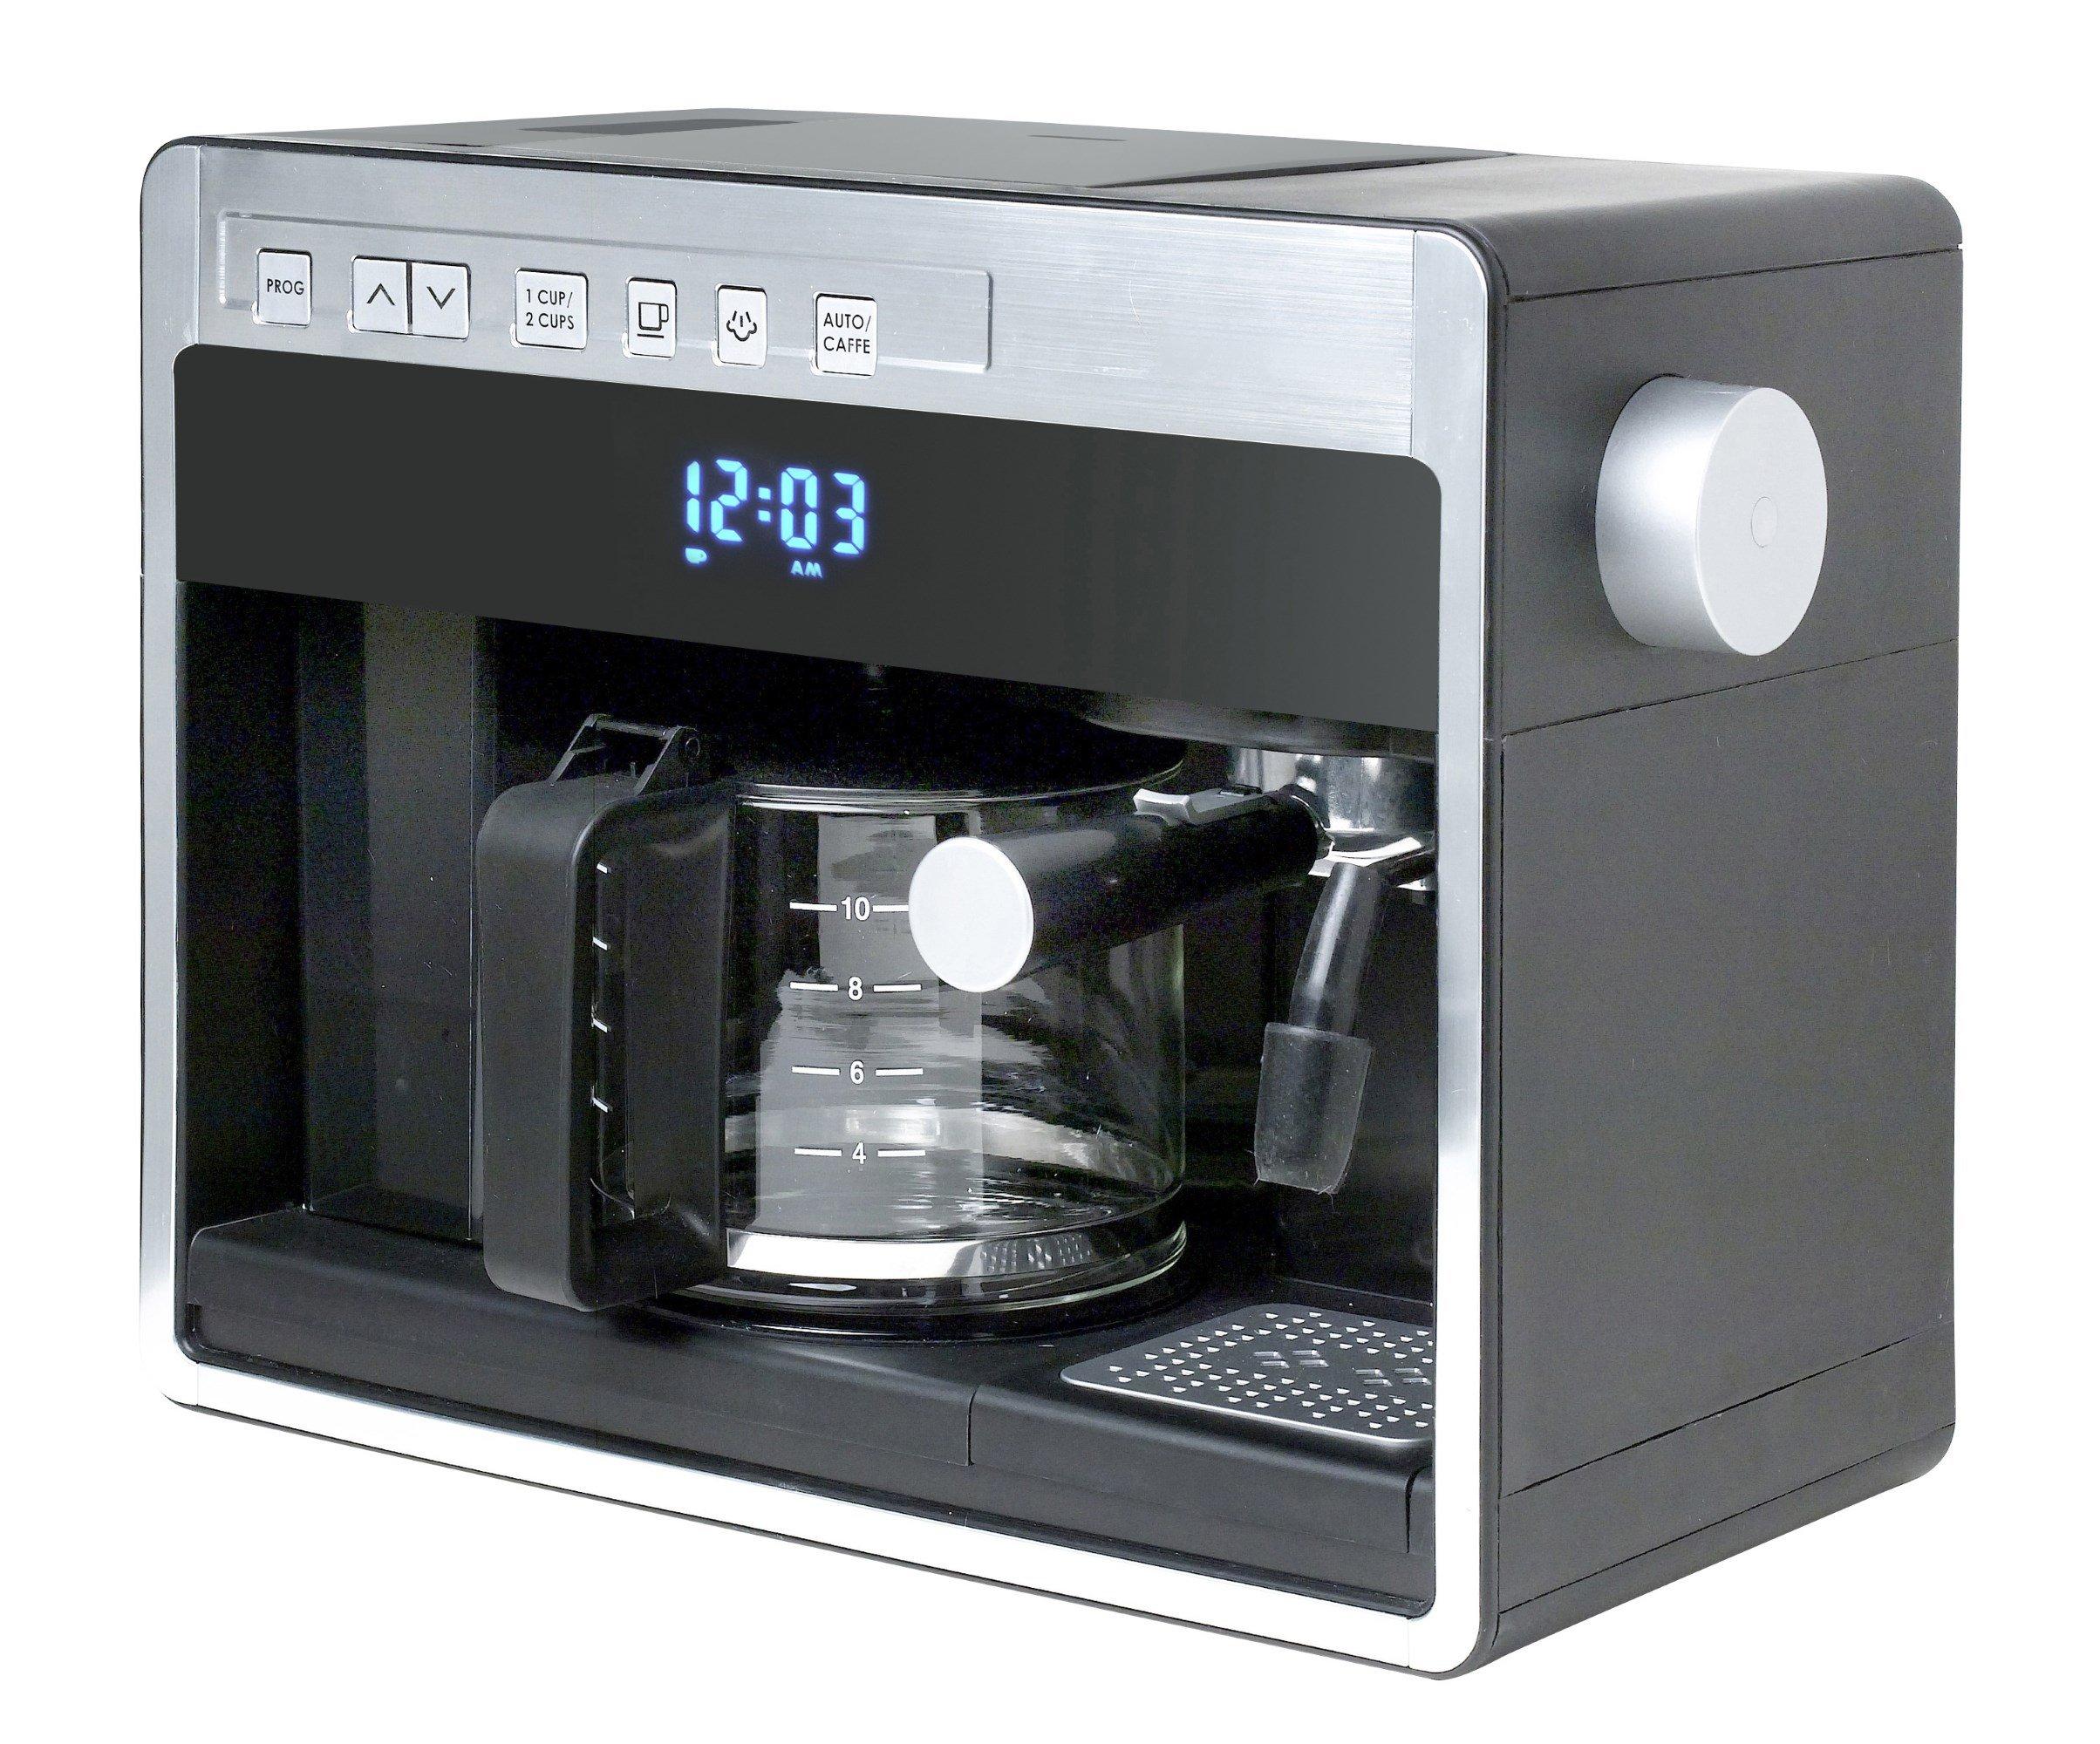 Espressione-DeLonghi of Italy 26161 New 3-in-1 Combination Coffee Beverage System, Black Silver